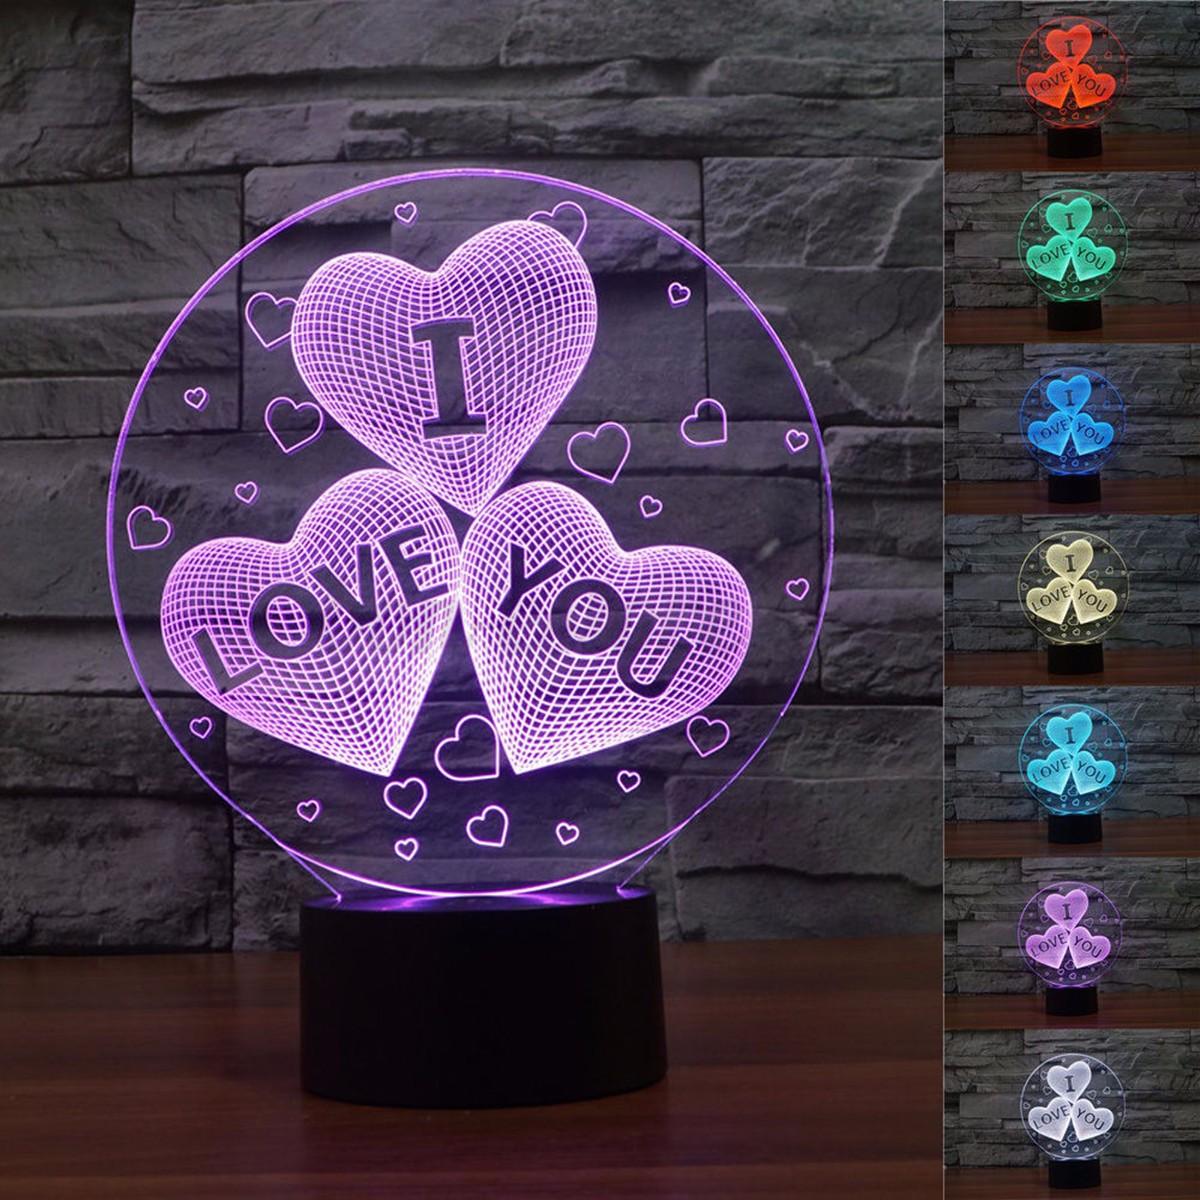 3D Illuminated Night Illusion Lights 7 Color Change LED ...